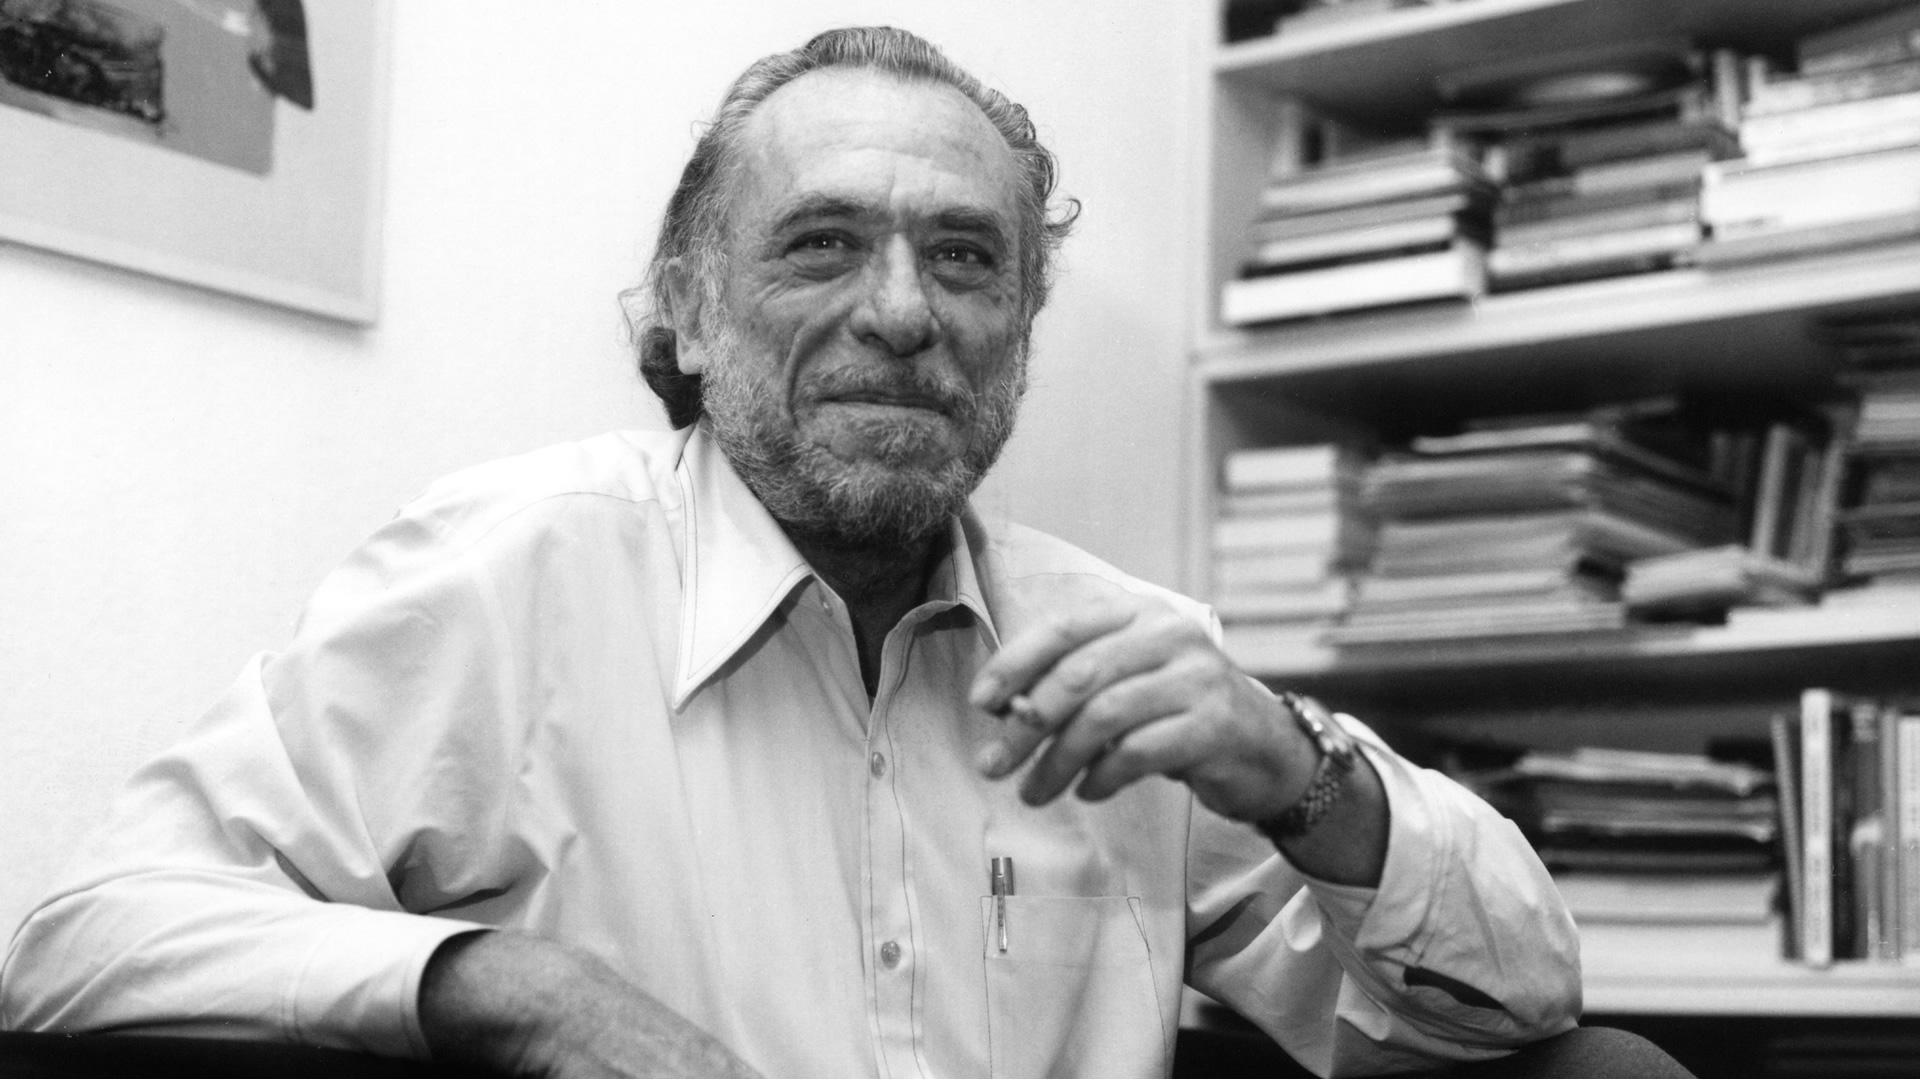 تشارلز بوكاوسكي Charles Bukowski